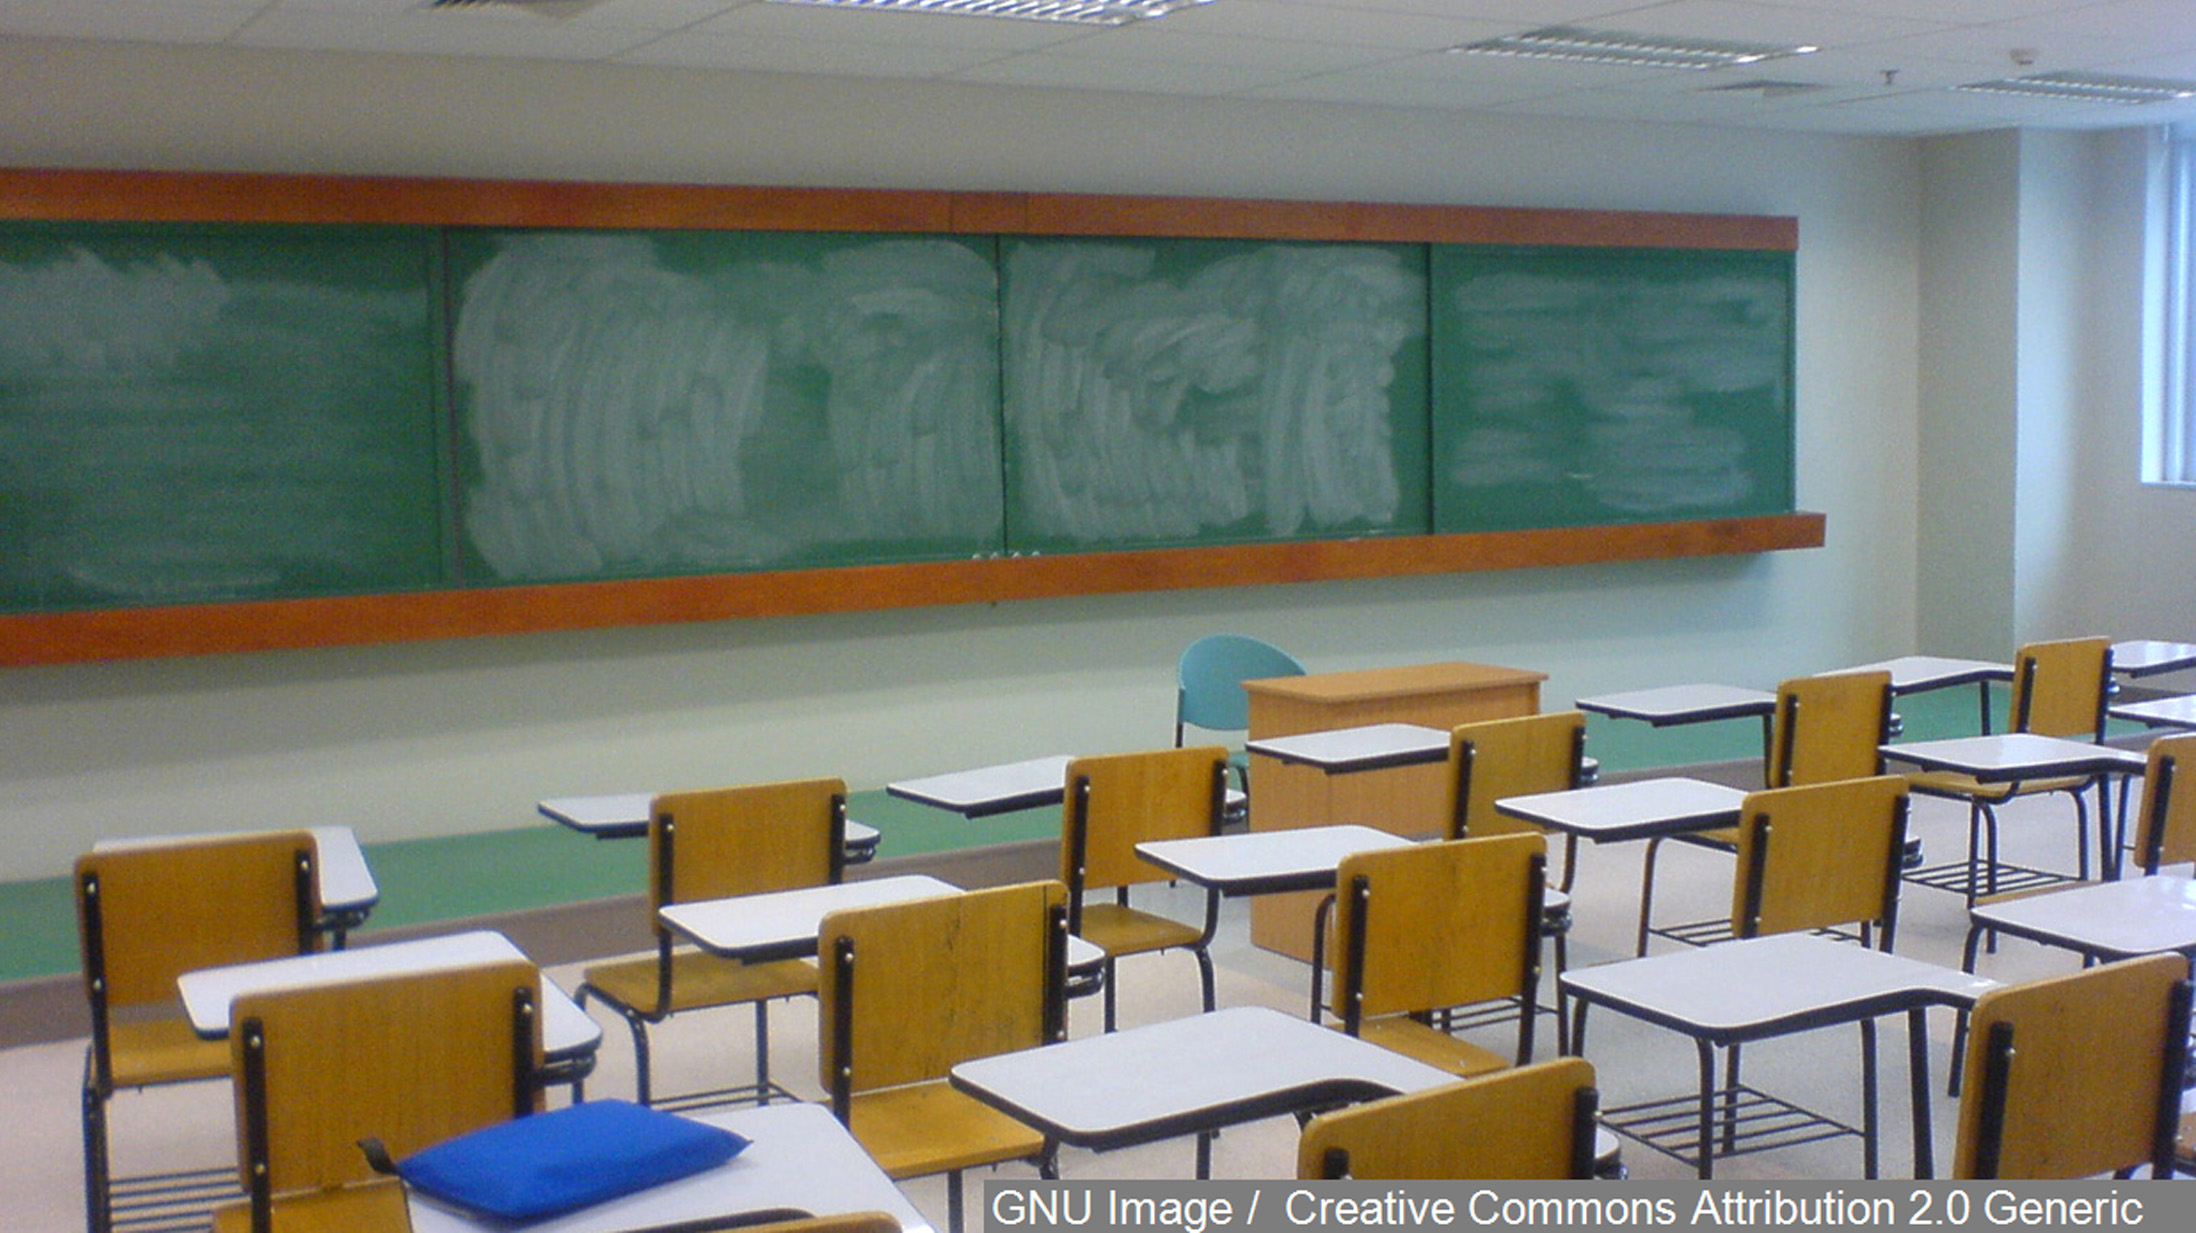 Classroom 10122015_1457758199093.jpg